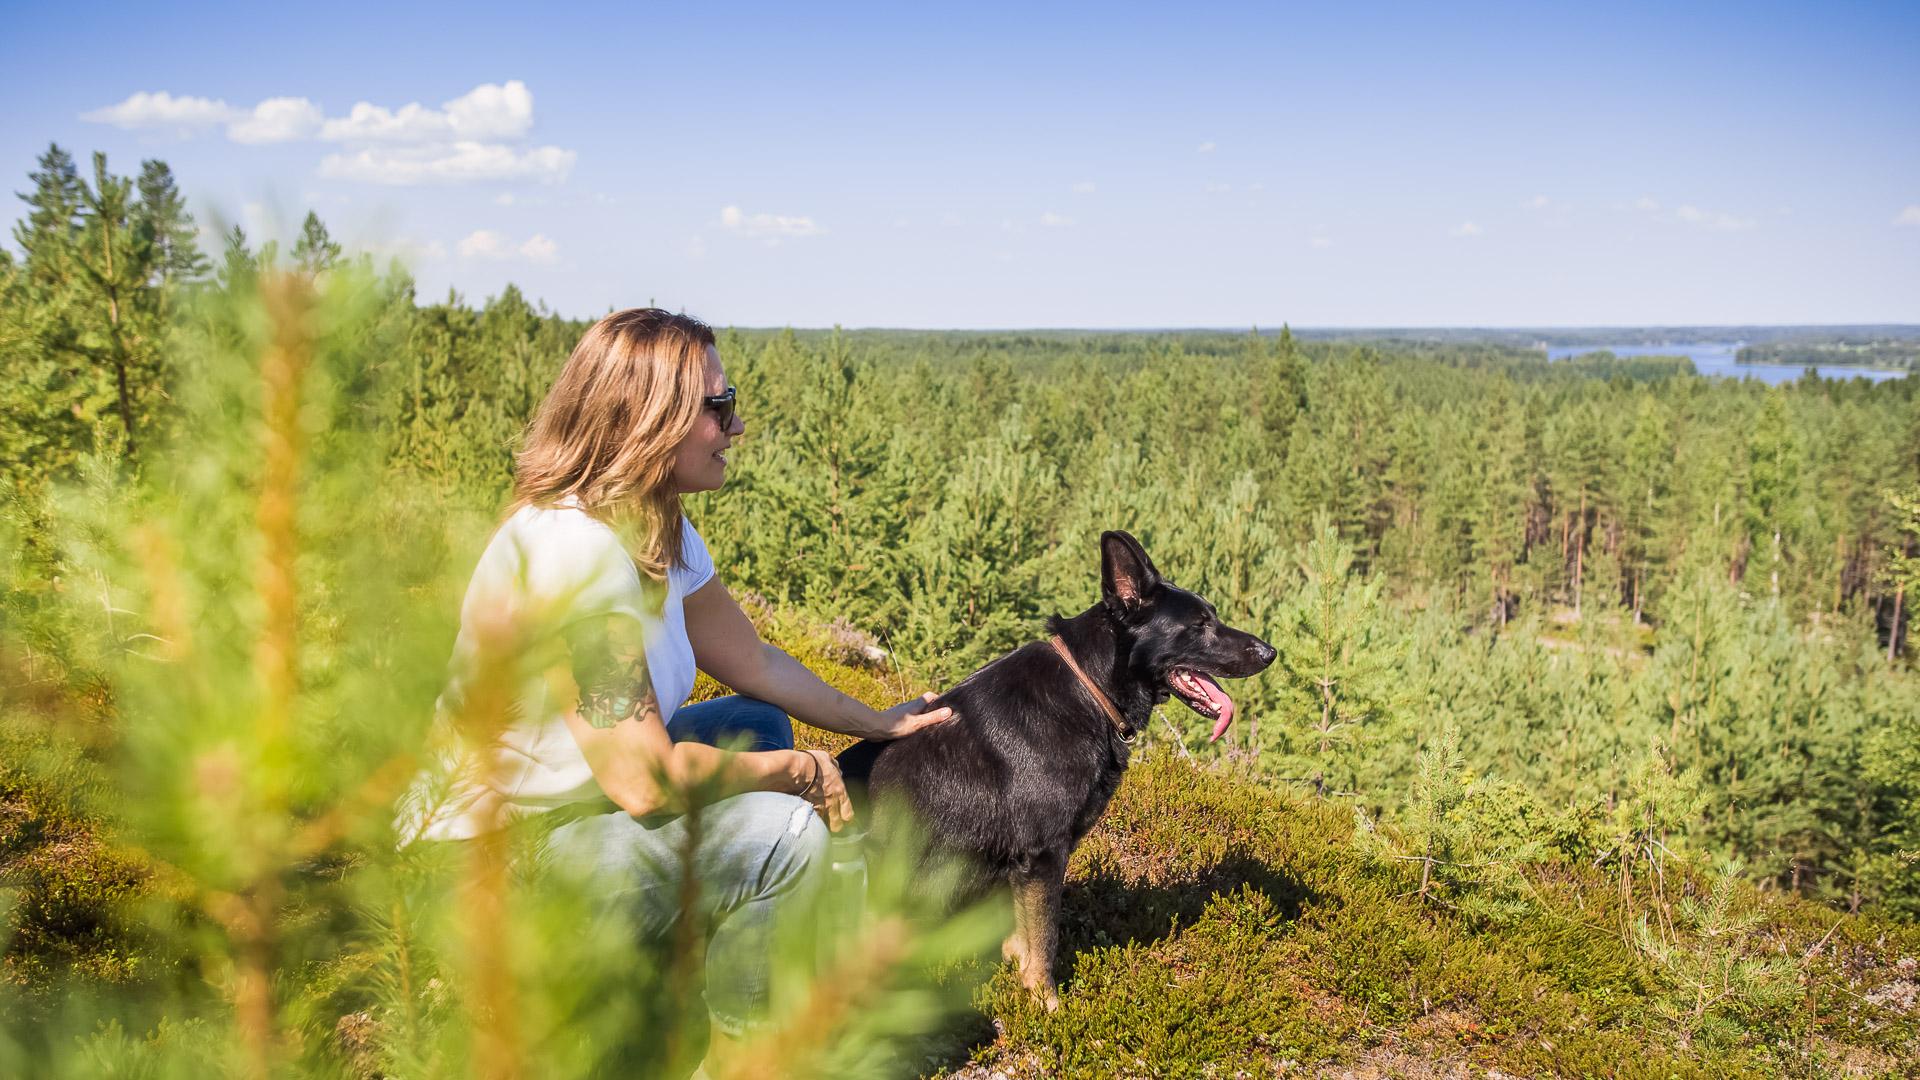 Visit Tampere Korsuretket Patikointi Hiking Forest Nature Laura Vanzo 35